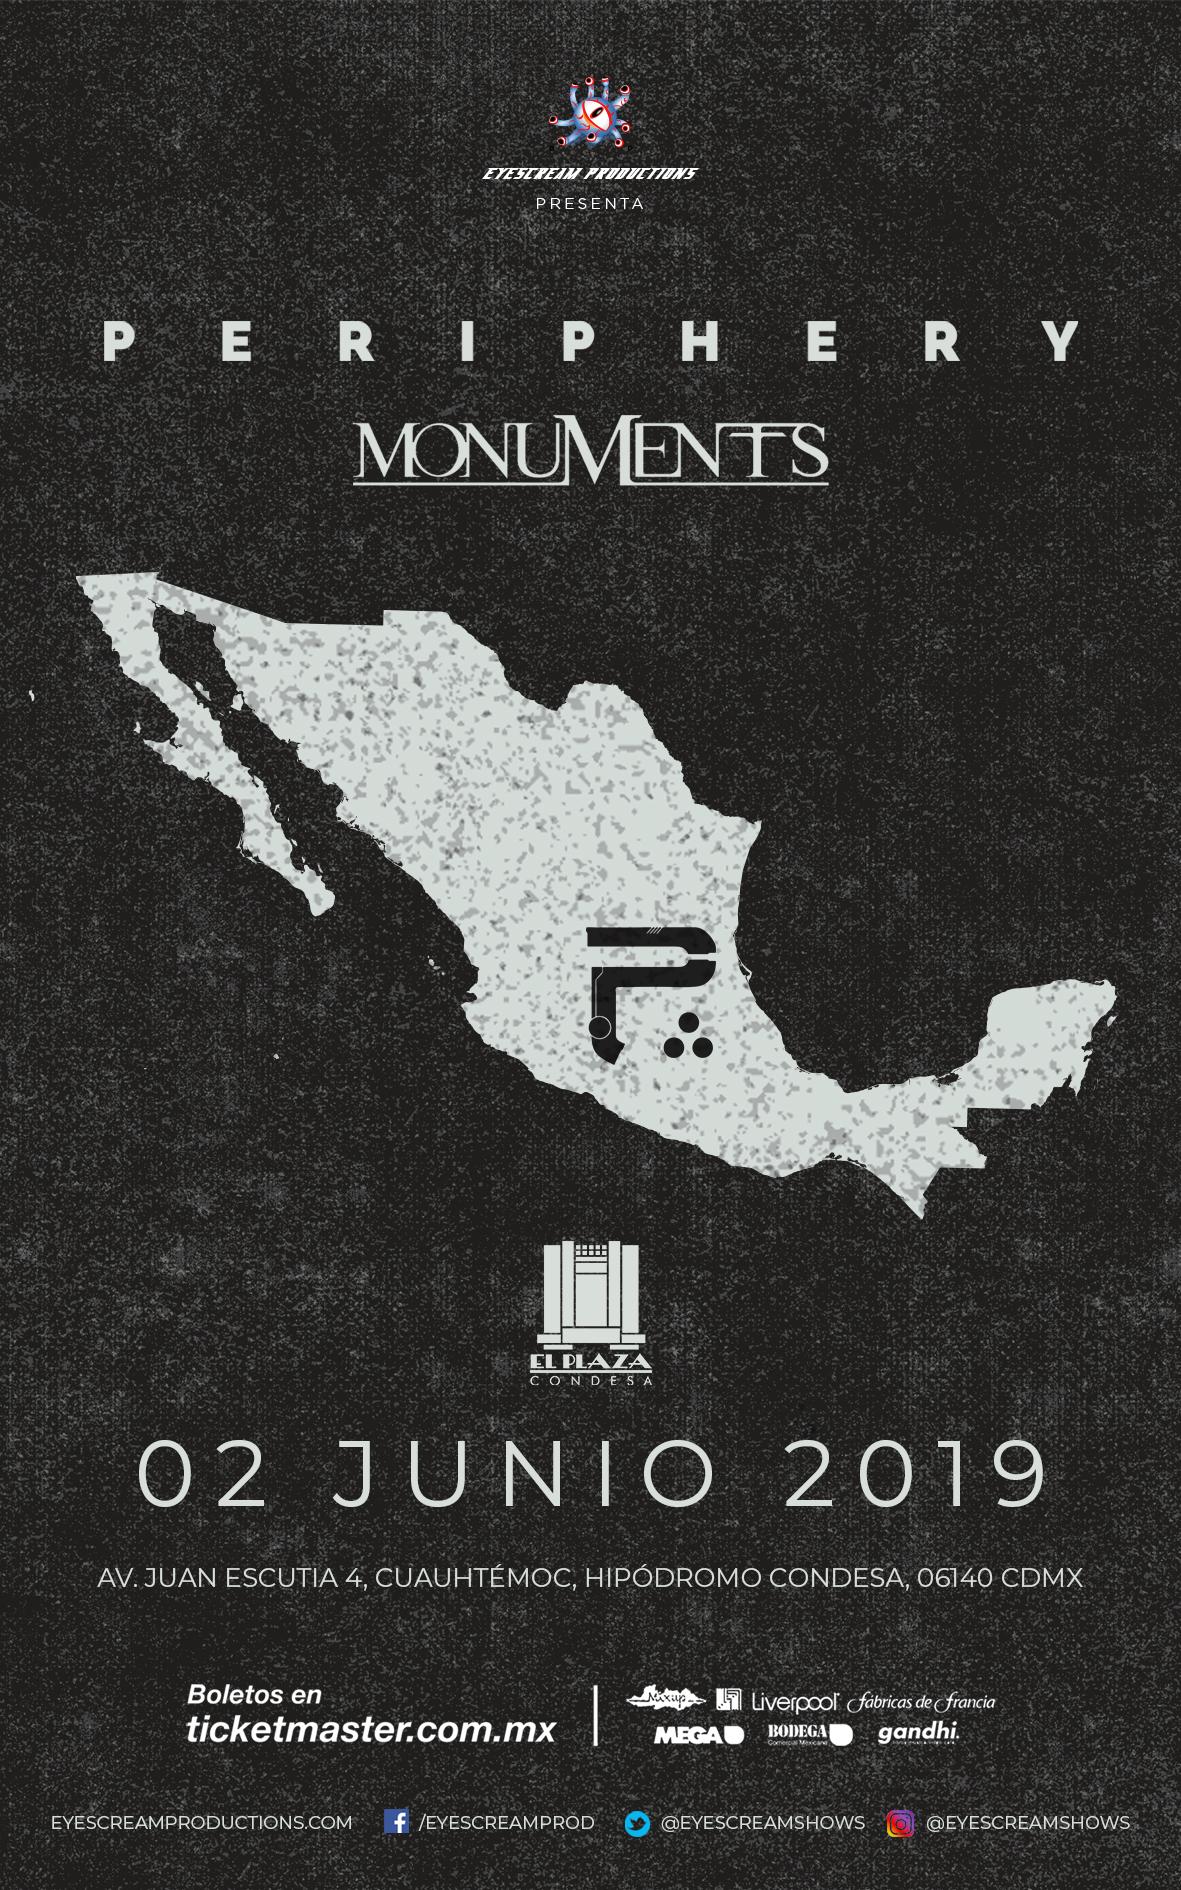 Periphery / Monuments